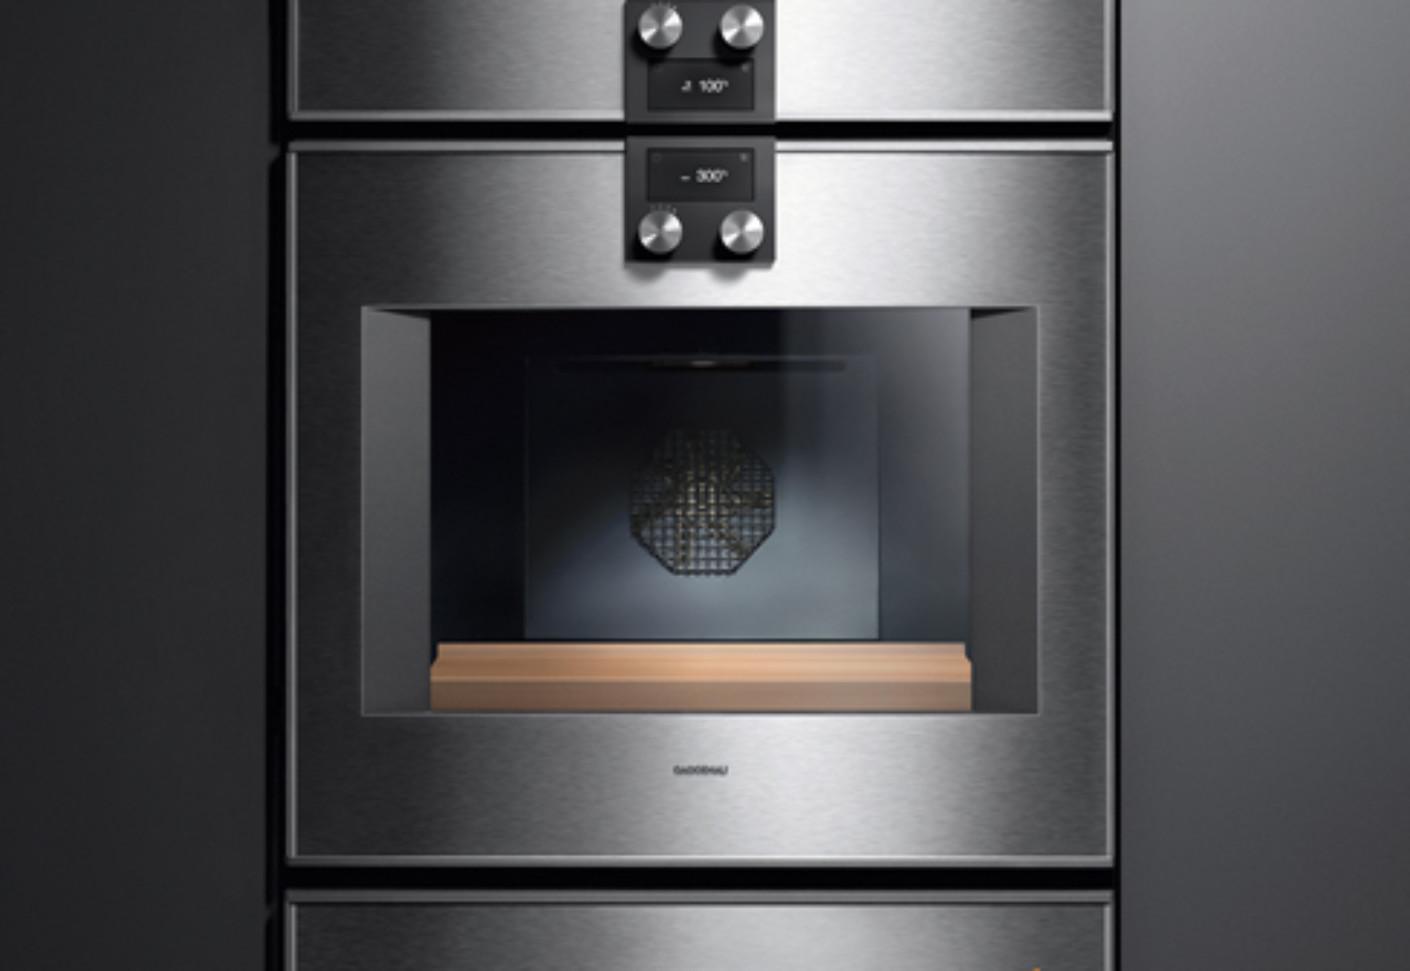 series 400 oven by gaggenau stylepark. Black Bedroom Furniture Sets. Home Design Ideas